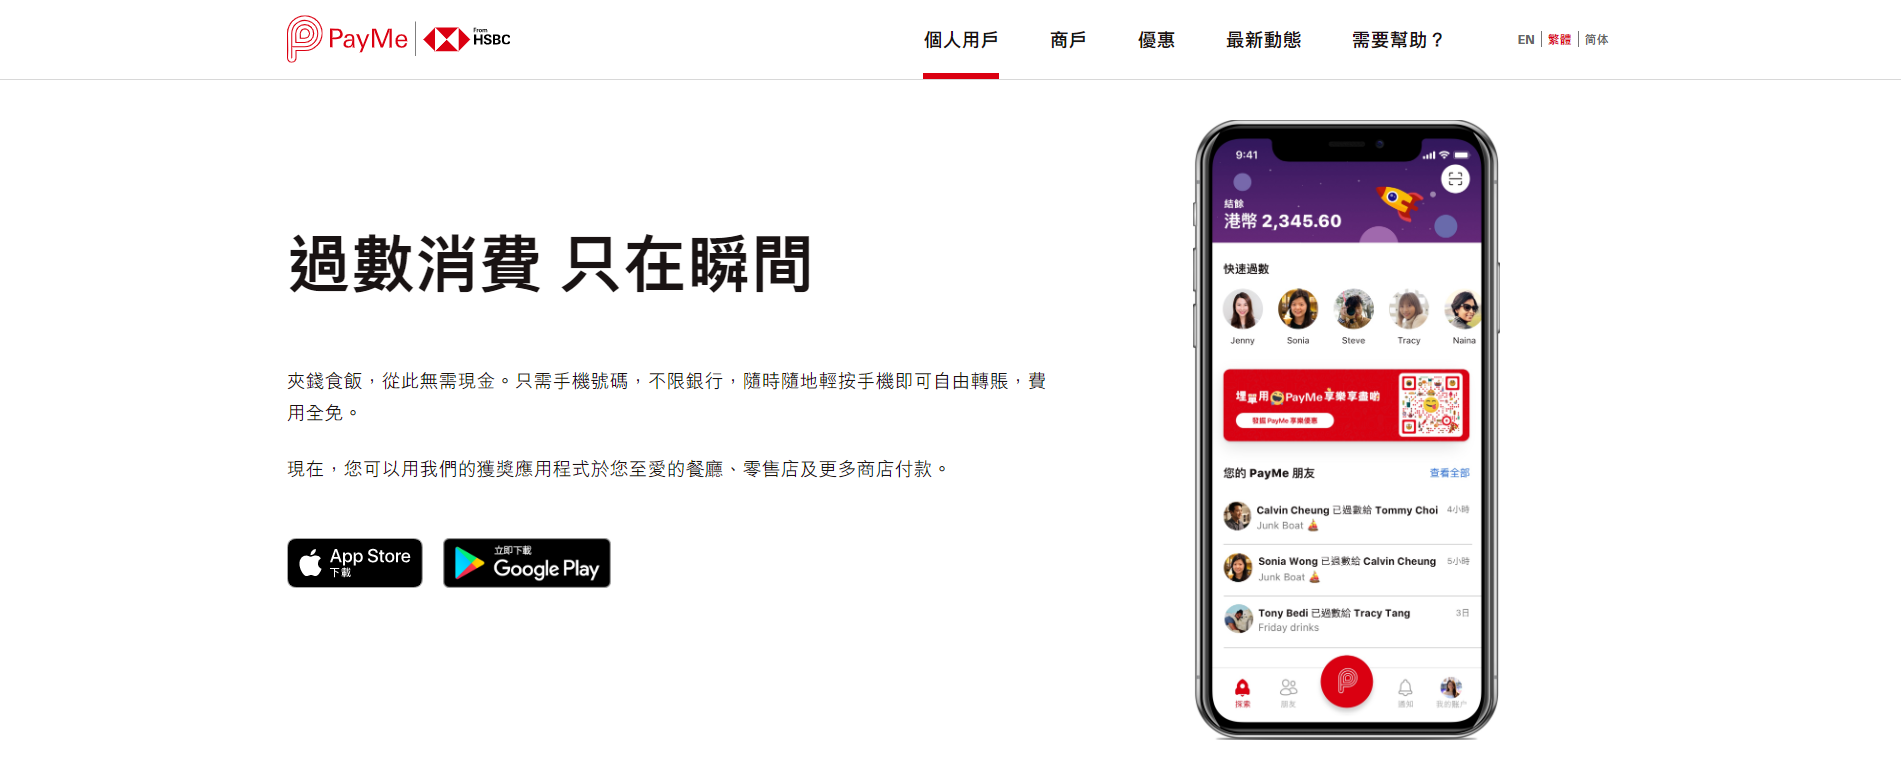 PayMe 為香港消費者最習慣的網購支付方式